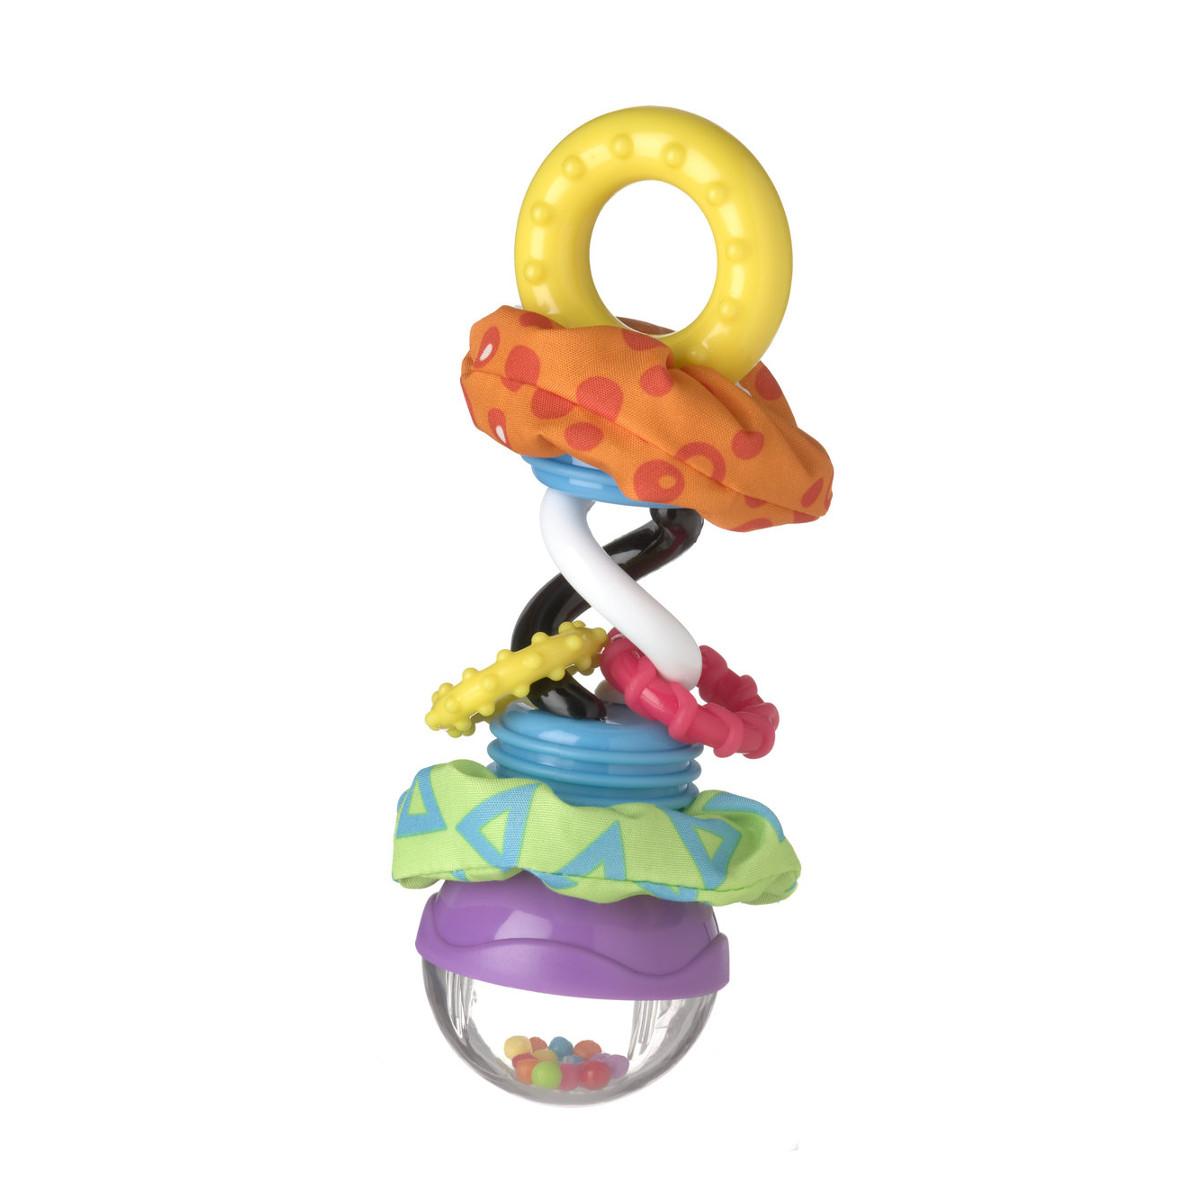 Погремушка Playgro Забавные шарики<br>